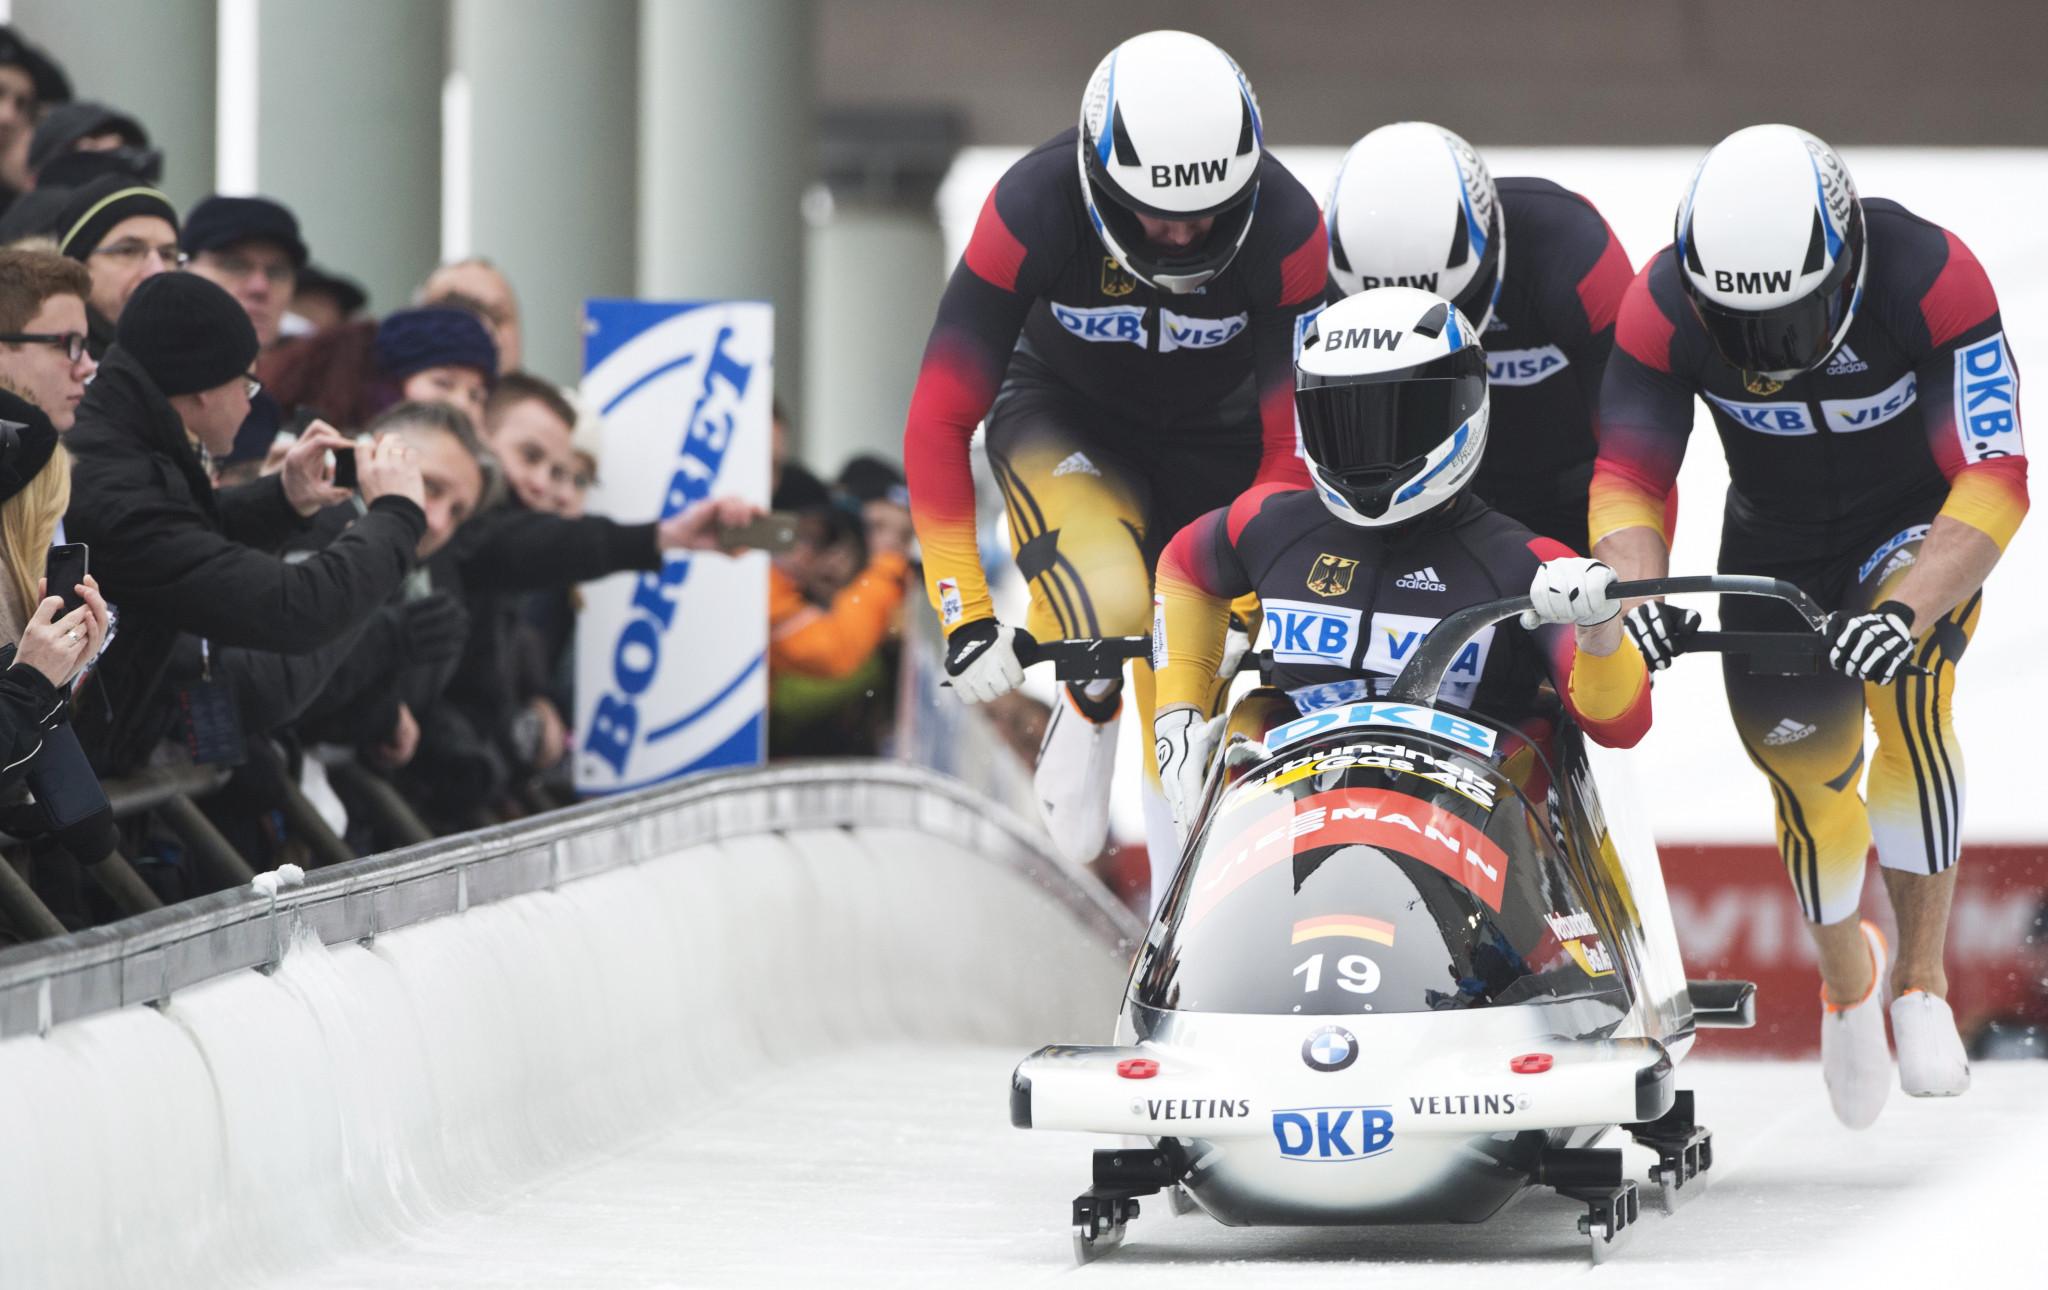 IBSF names Winterberg as host of 2021 European Championships